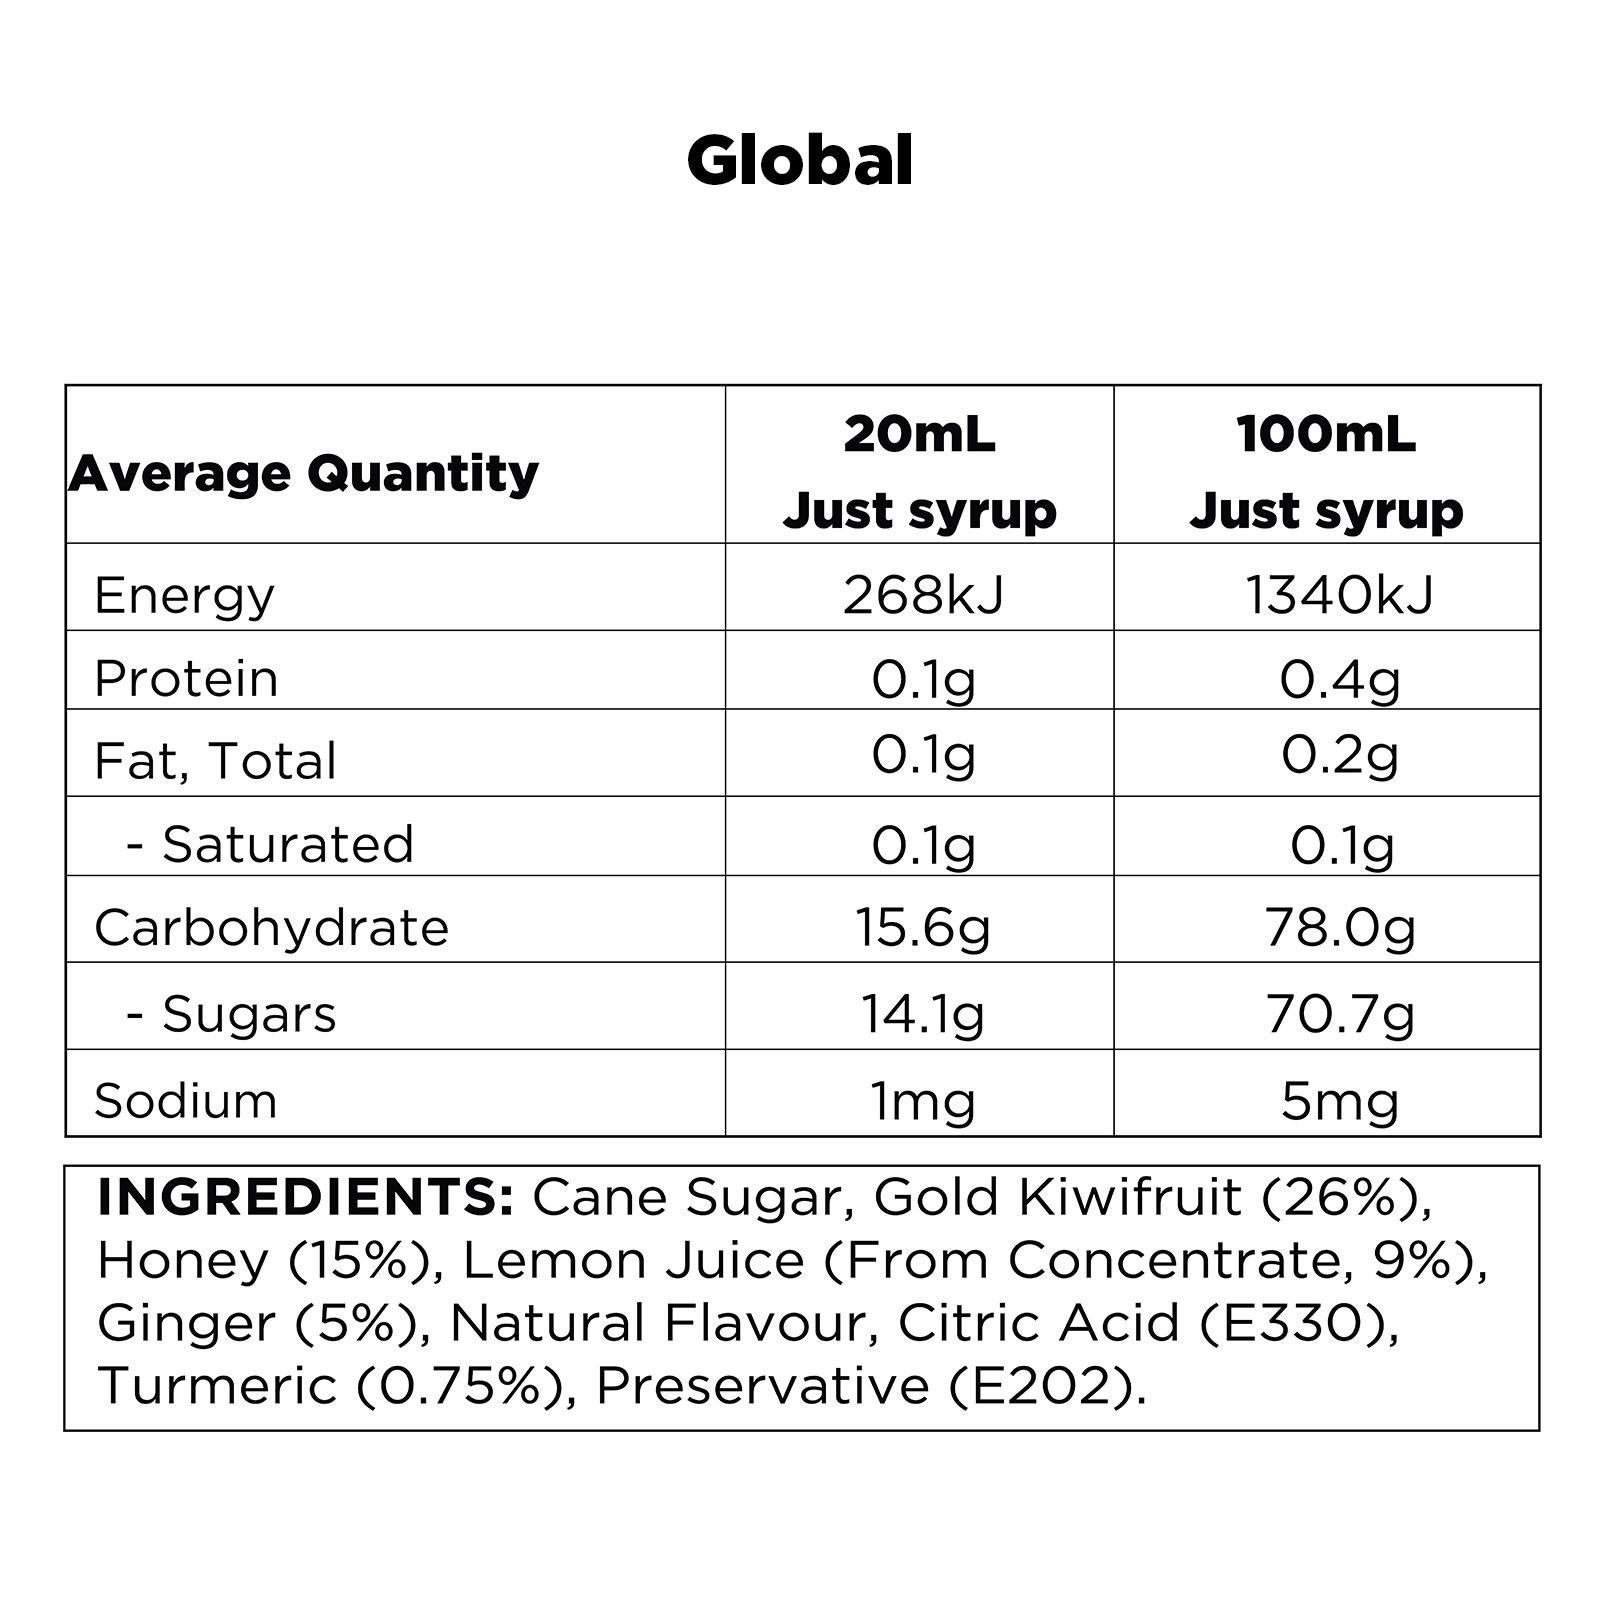 q-gold-kiwi-turmeric-ginger-nutritional-information